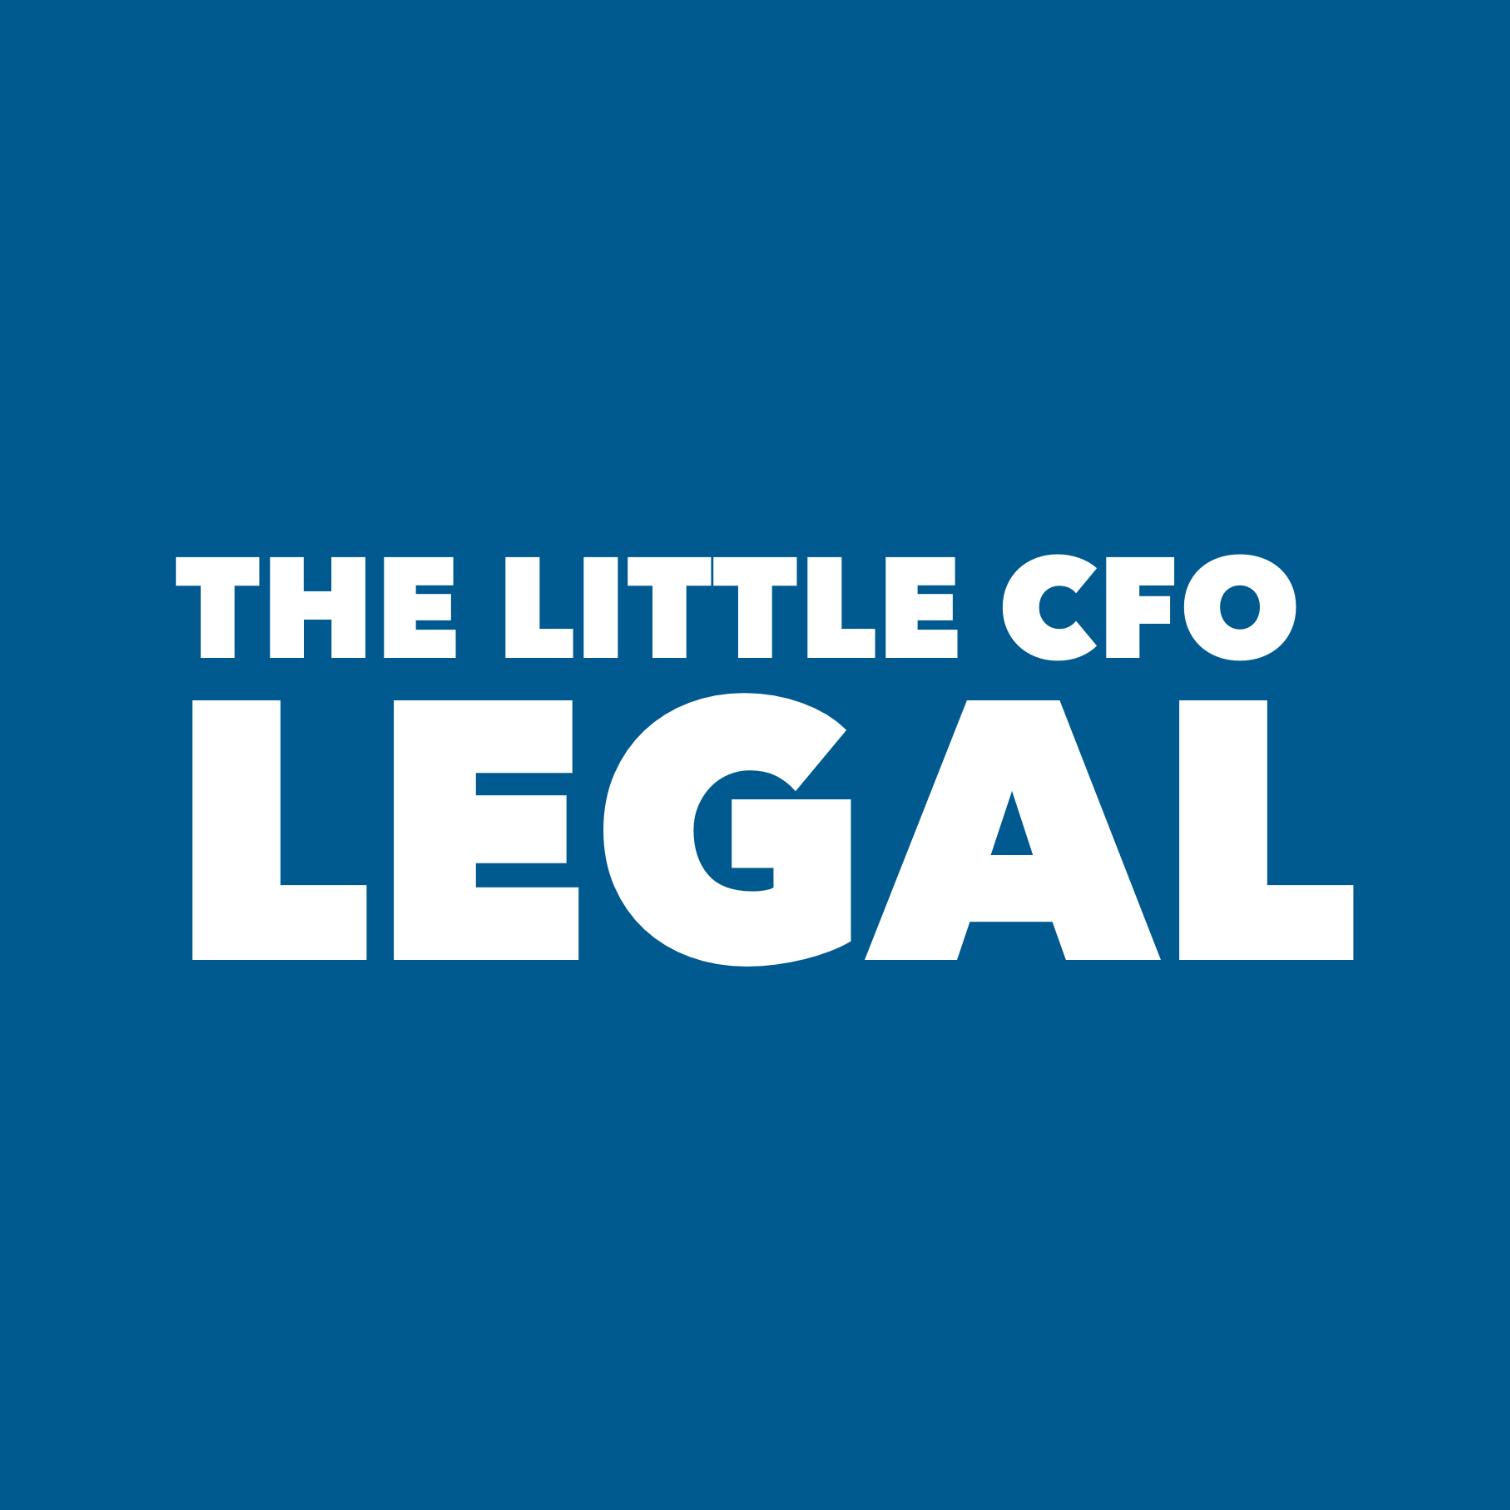 The Little CFO Legal